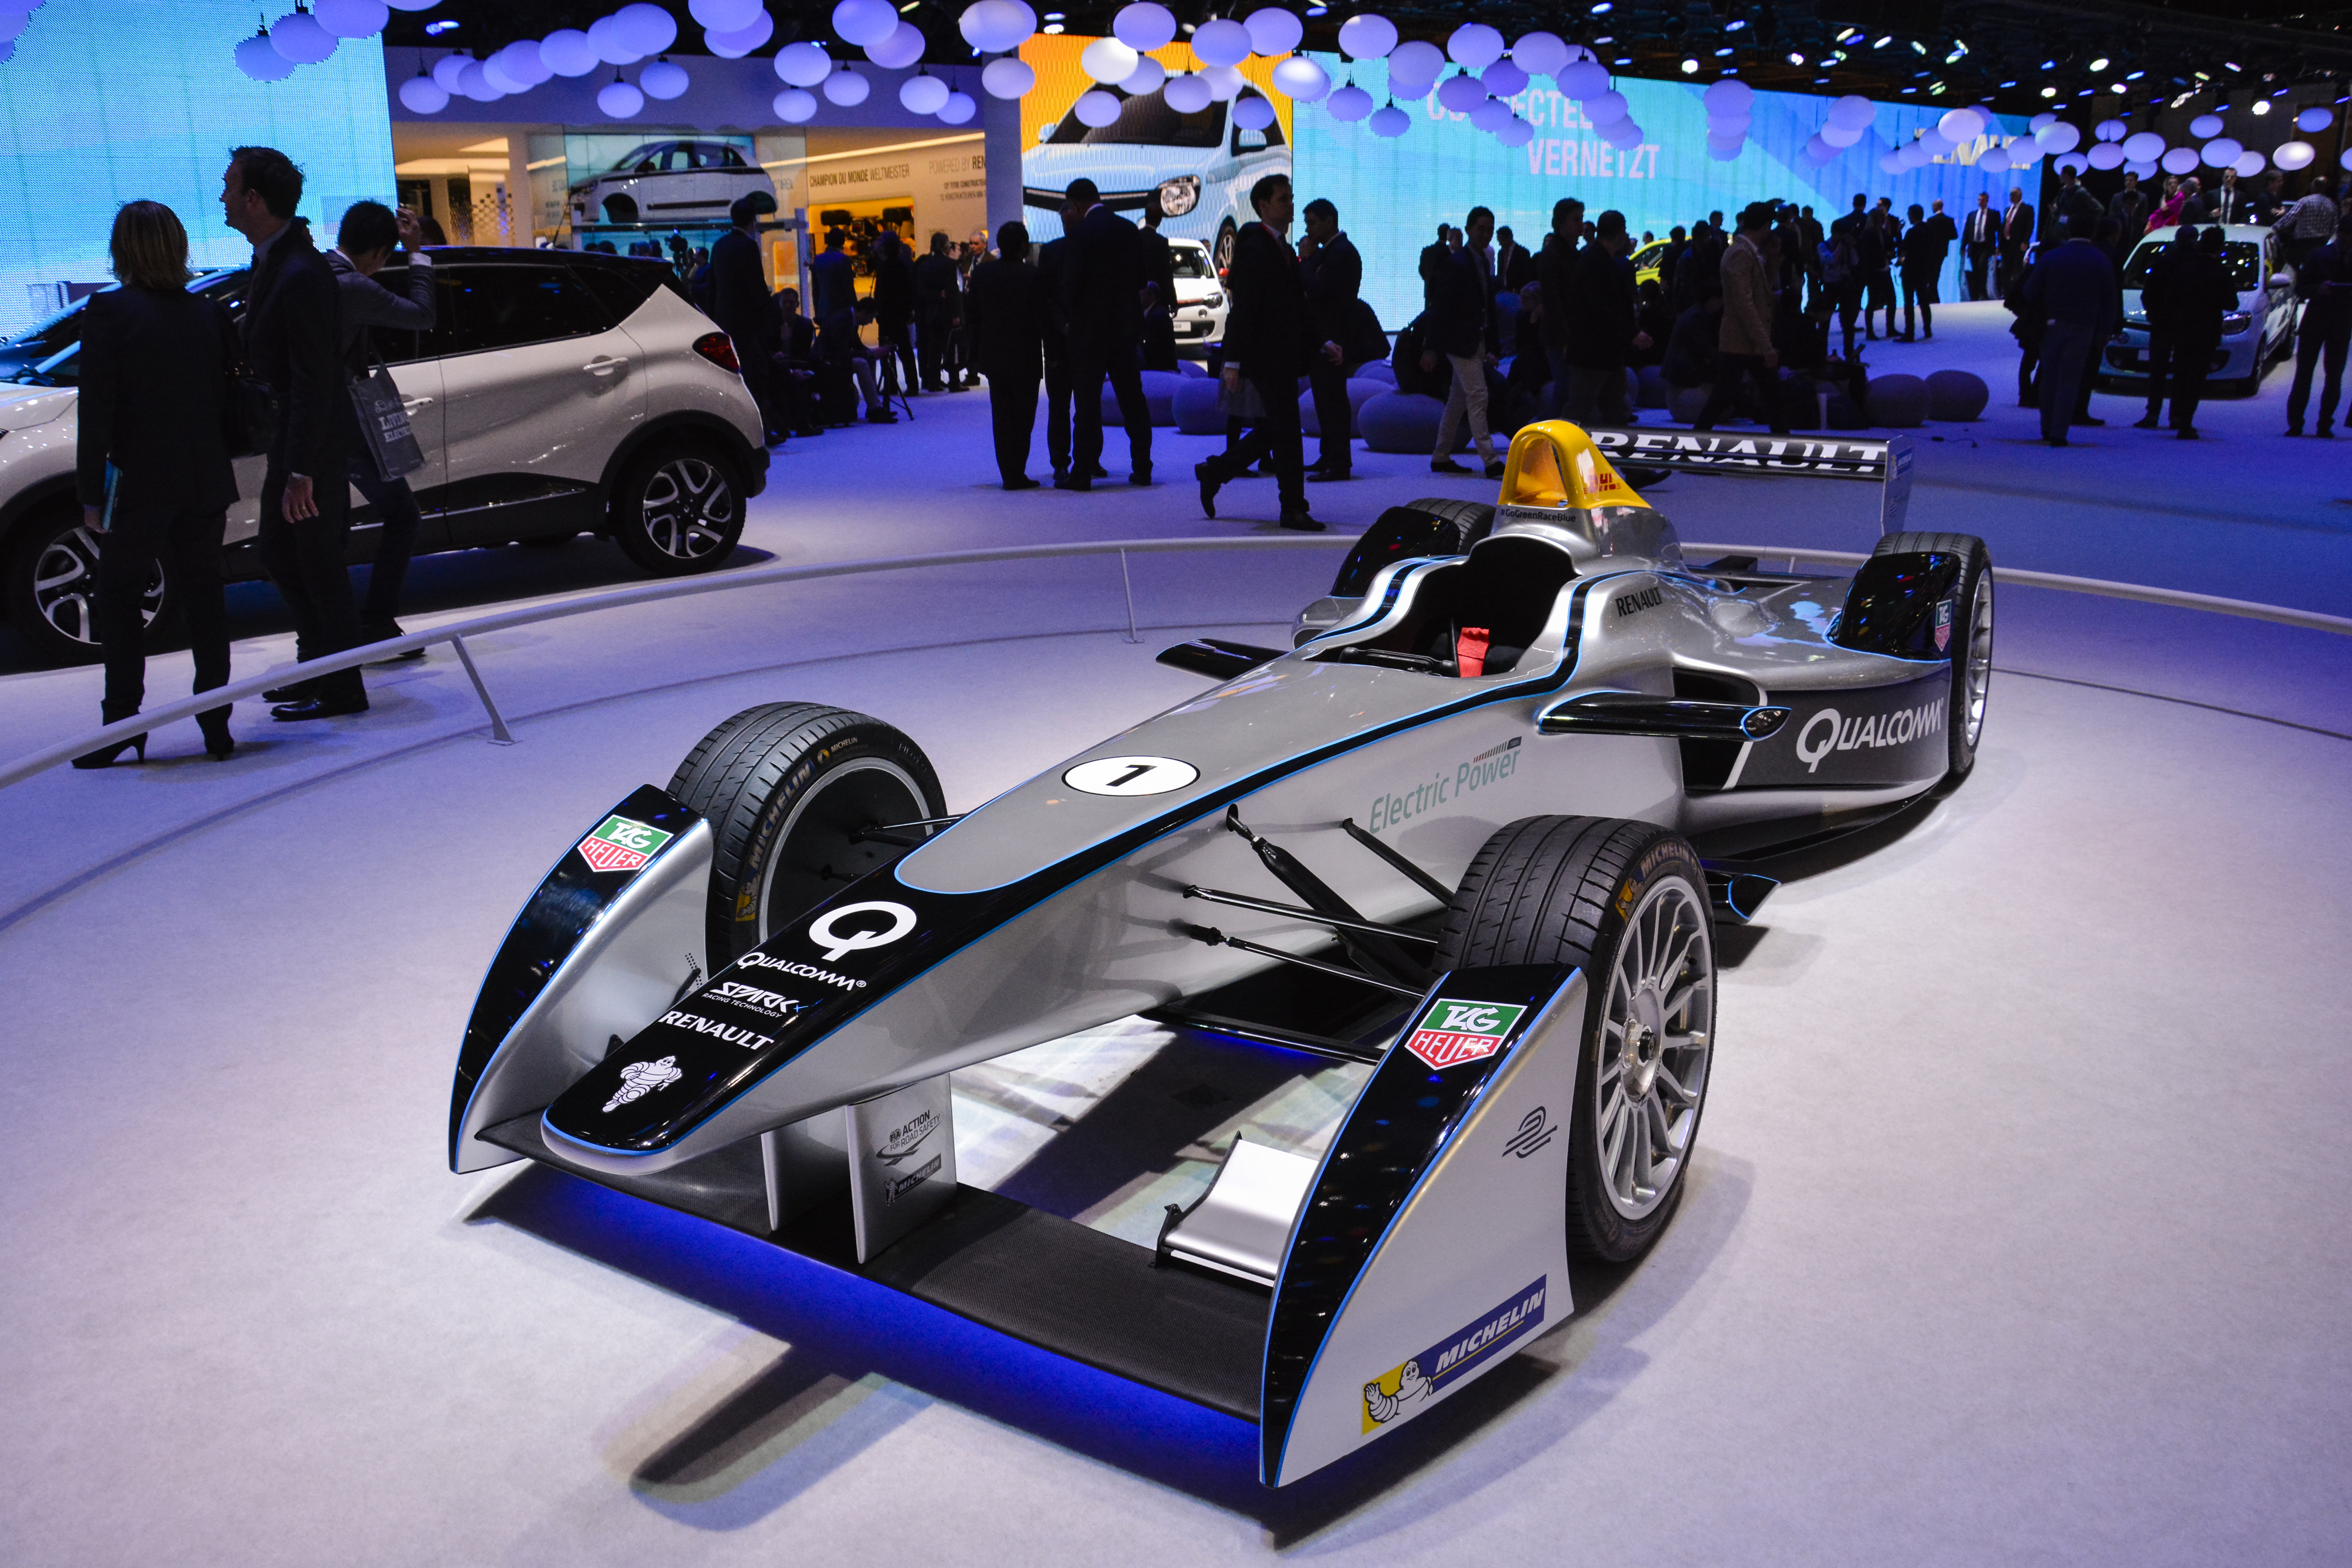 Electric formula 1 car